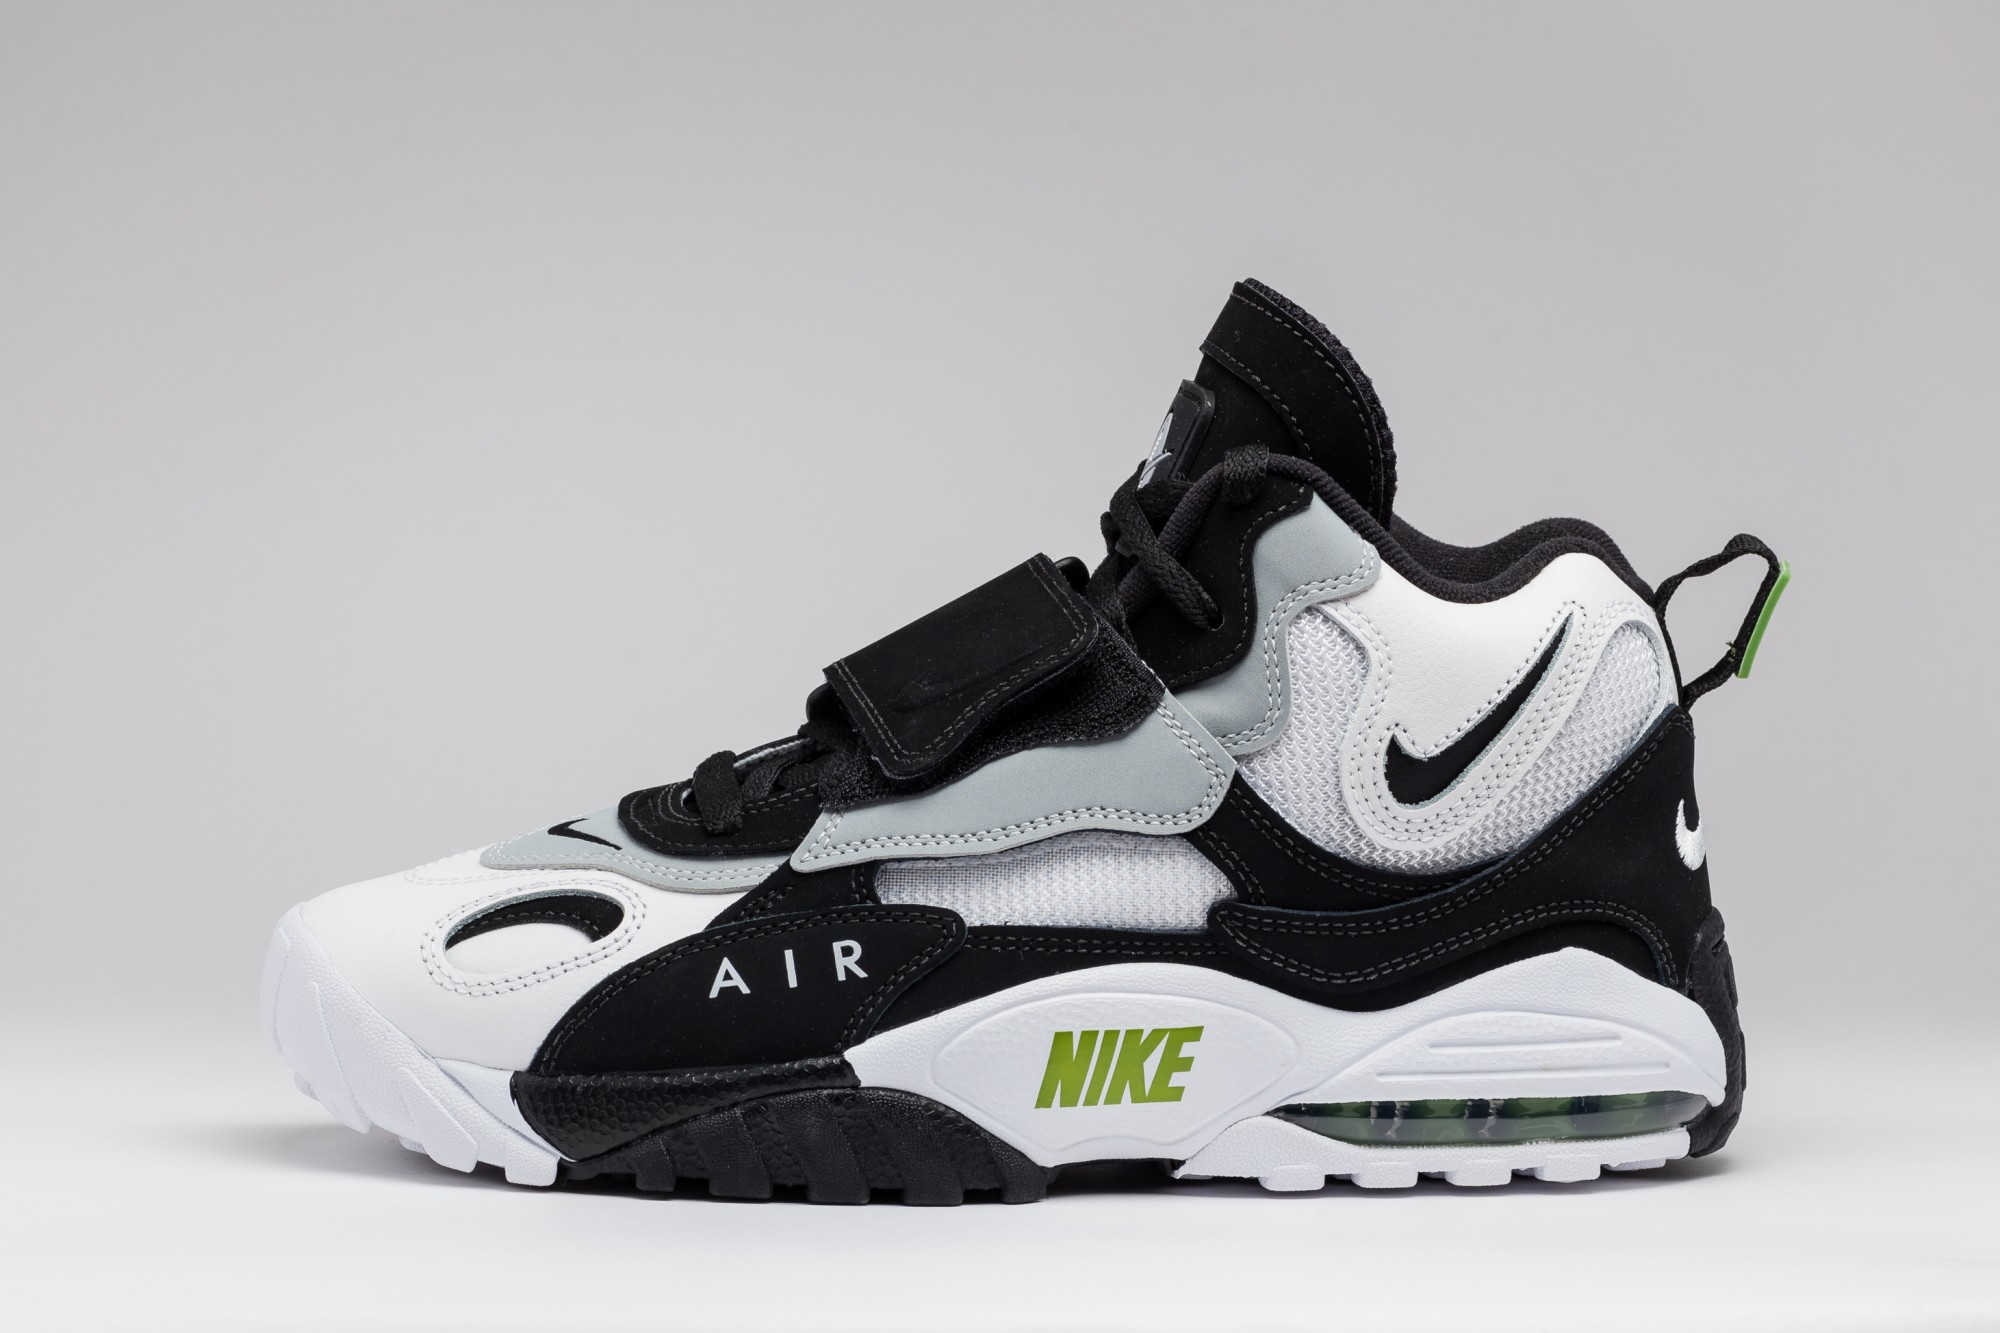 huge discount 1a415 d3895 Comanda Nike Air Max Speed Turf 100% originali | SneakerIndustry